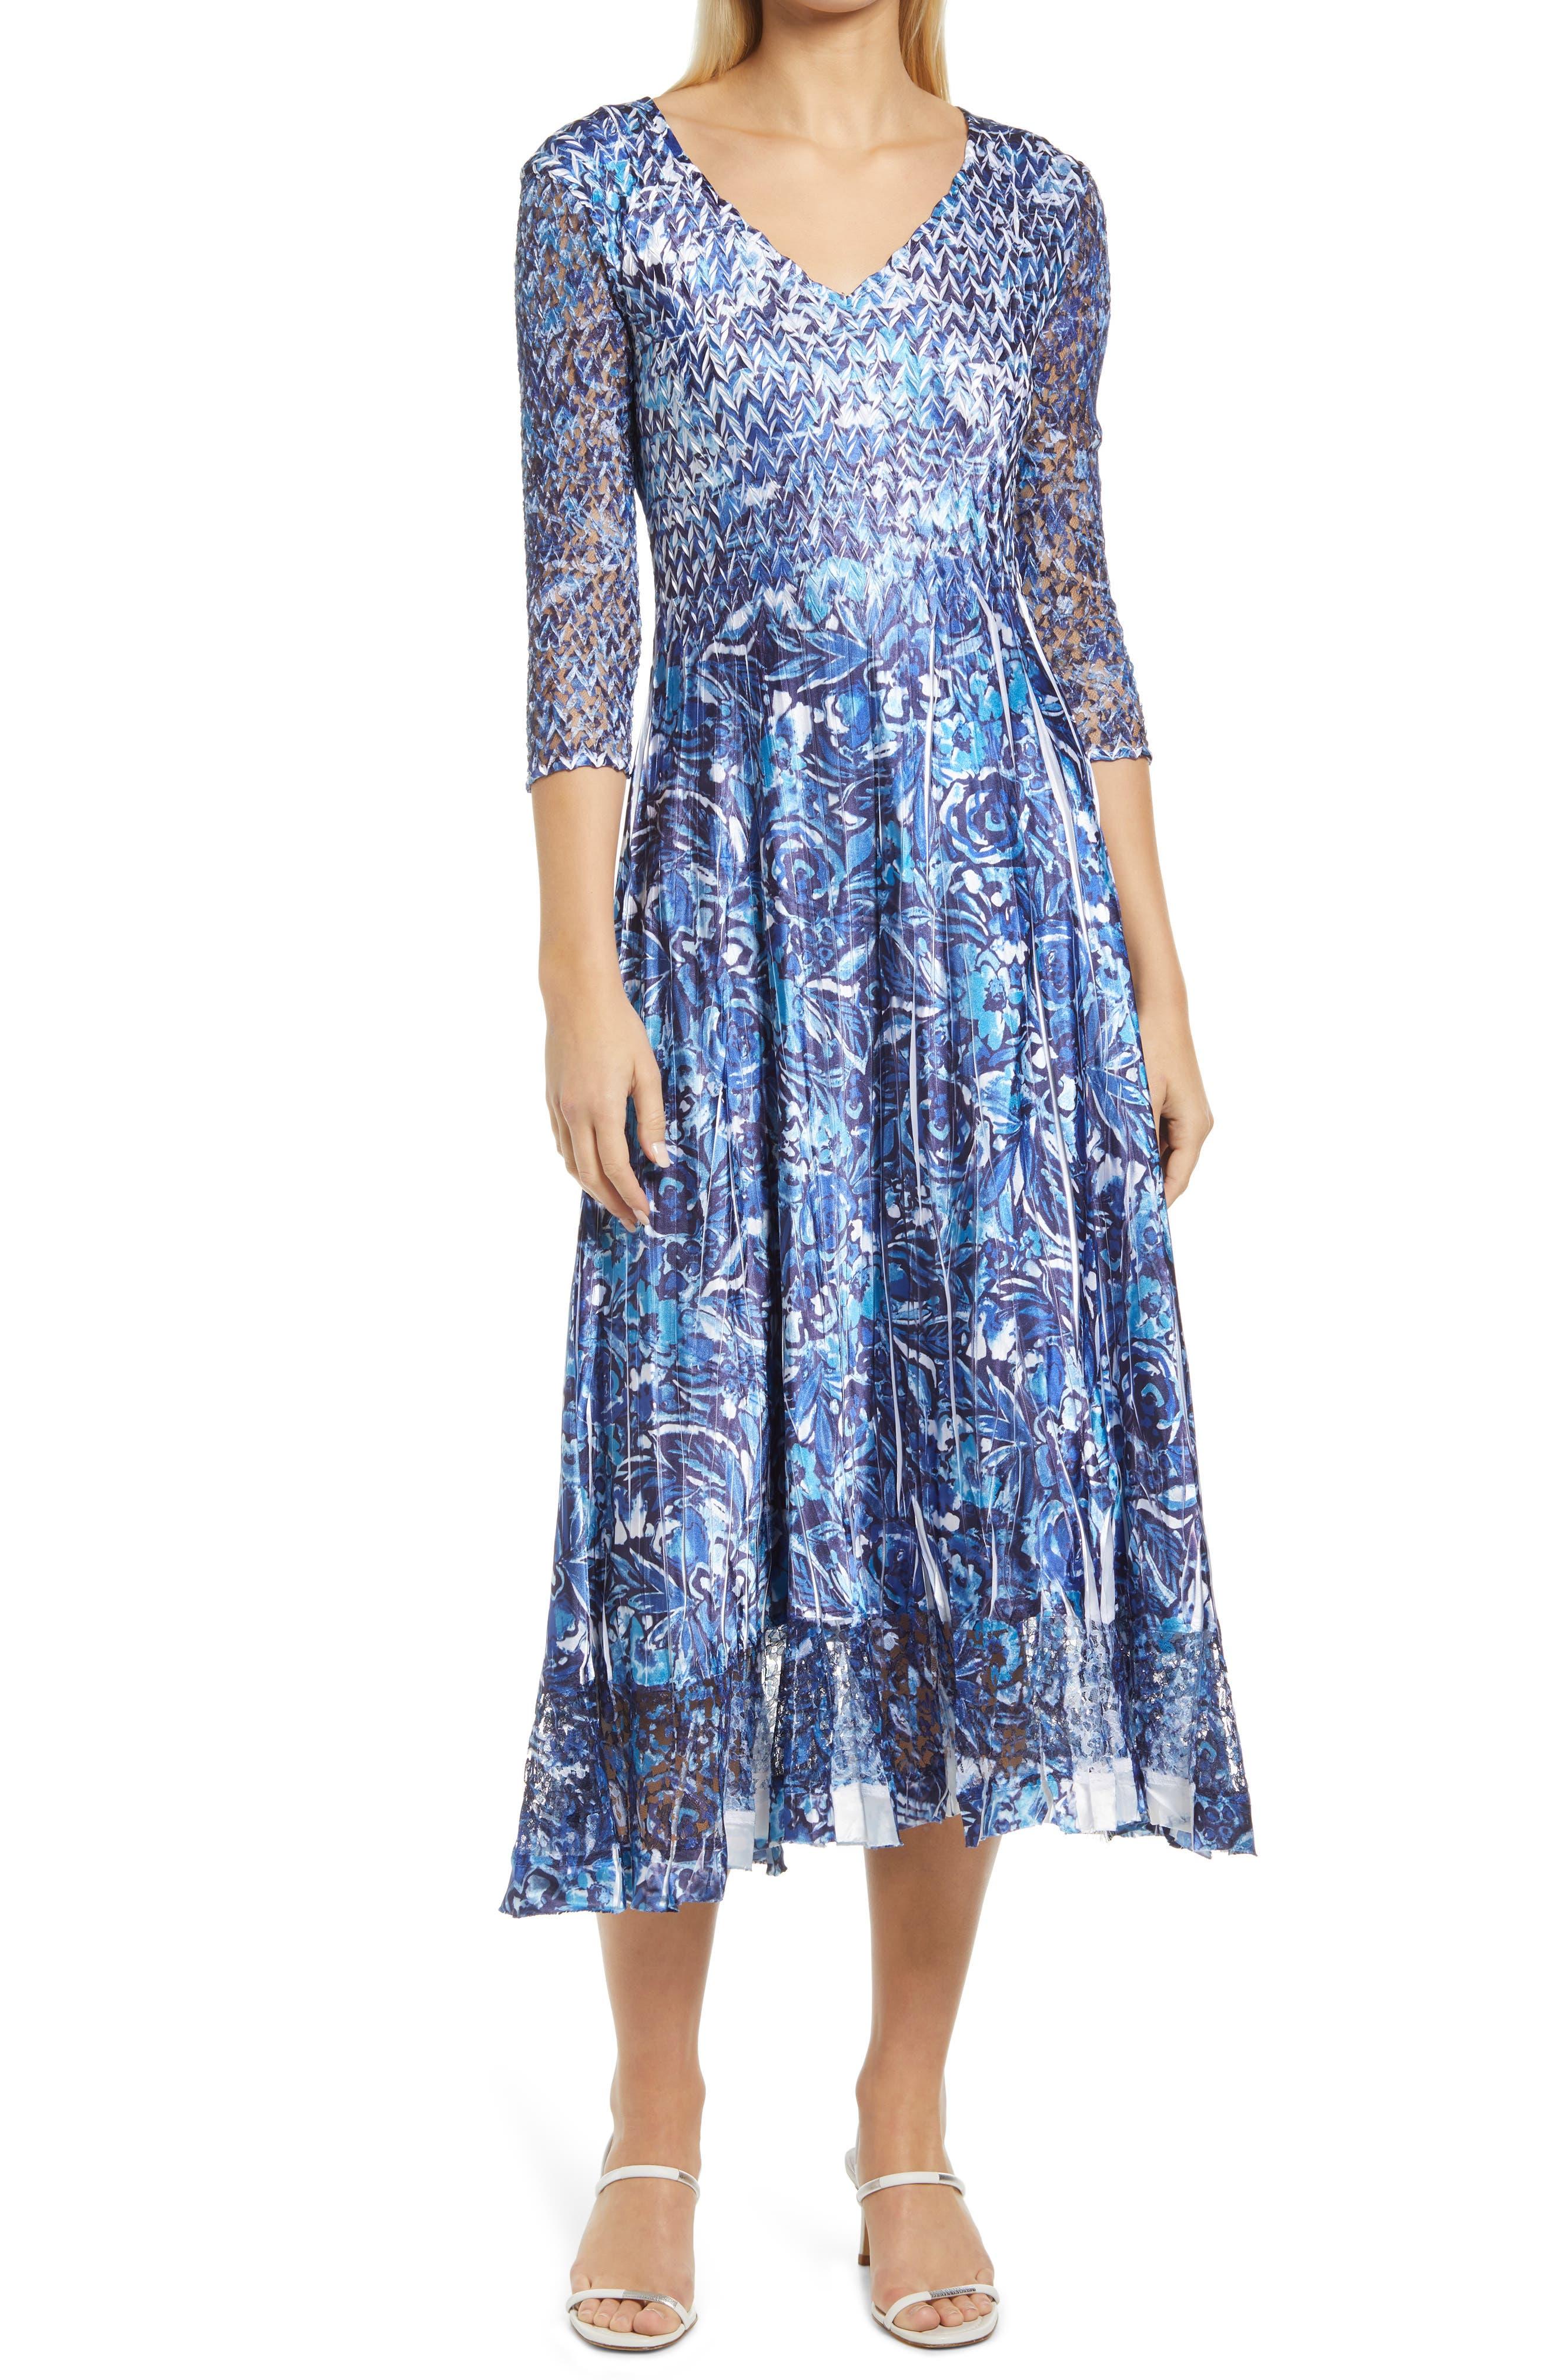 Lace Sleeve Charmuse Midi Cocktail Dress